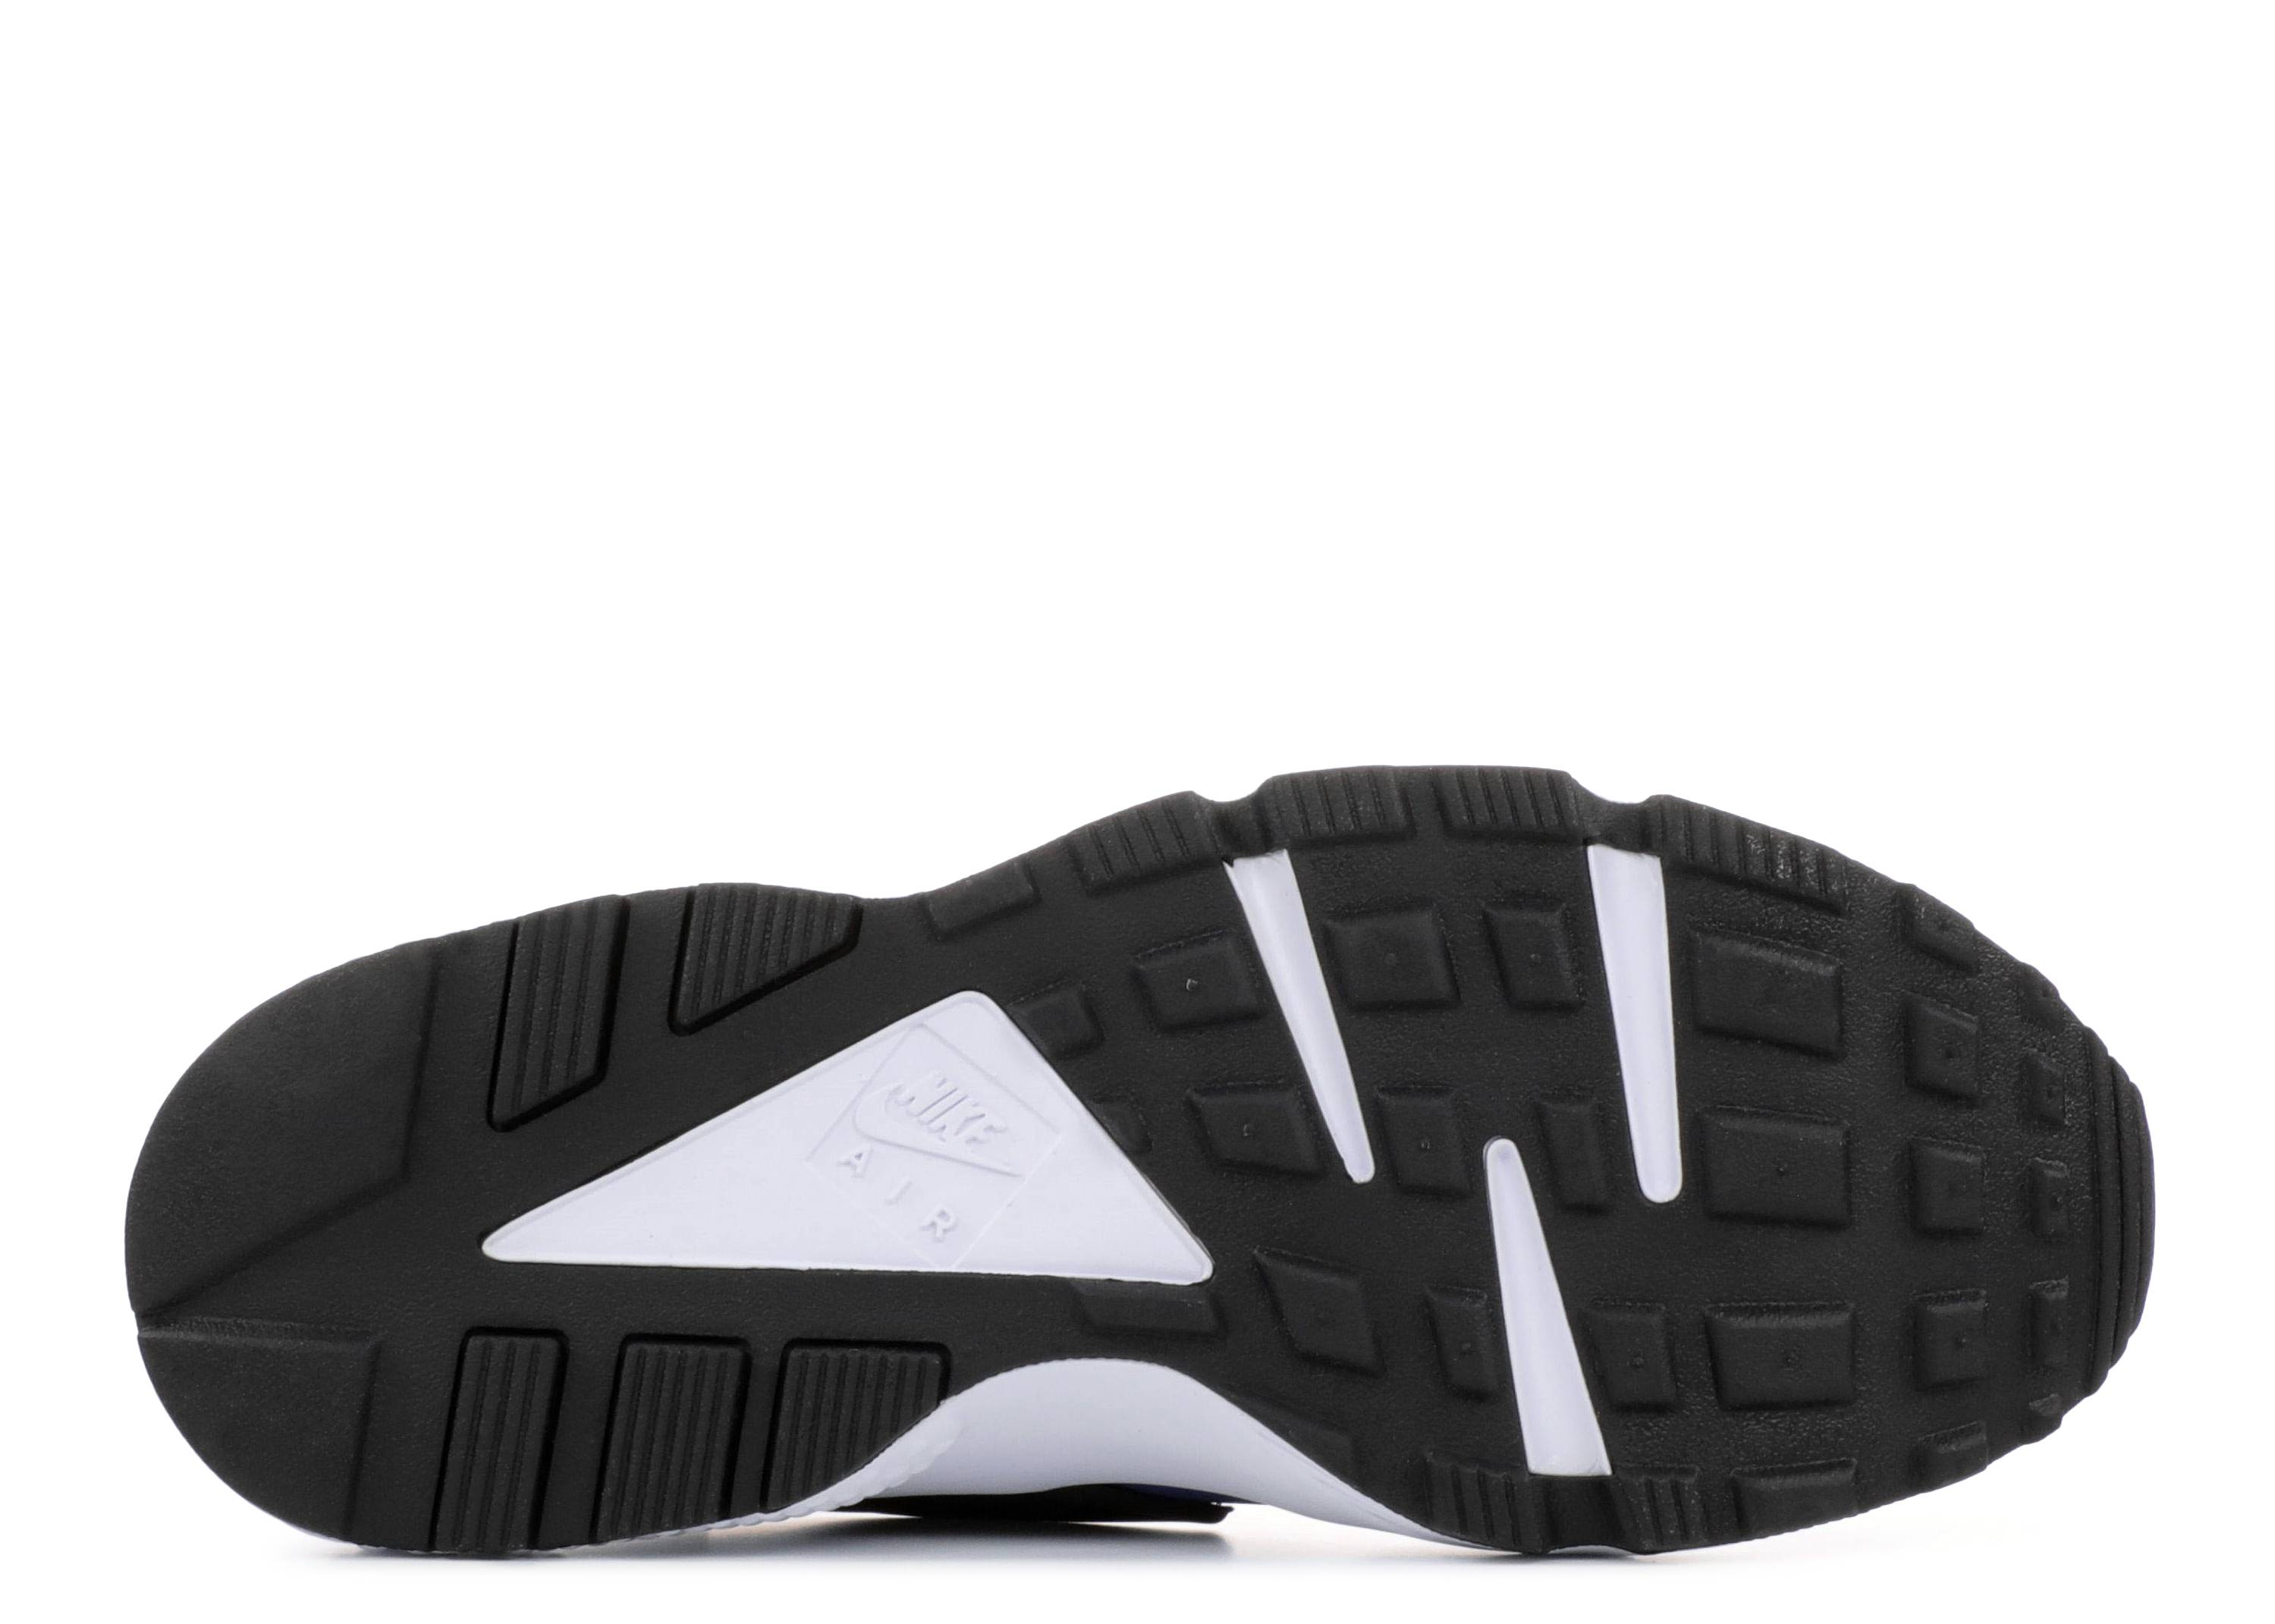 4efdf122ce2 Nike Air Huarache - Nike - 318429 411 - deep royal blue black-white ...